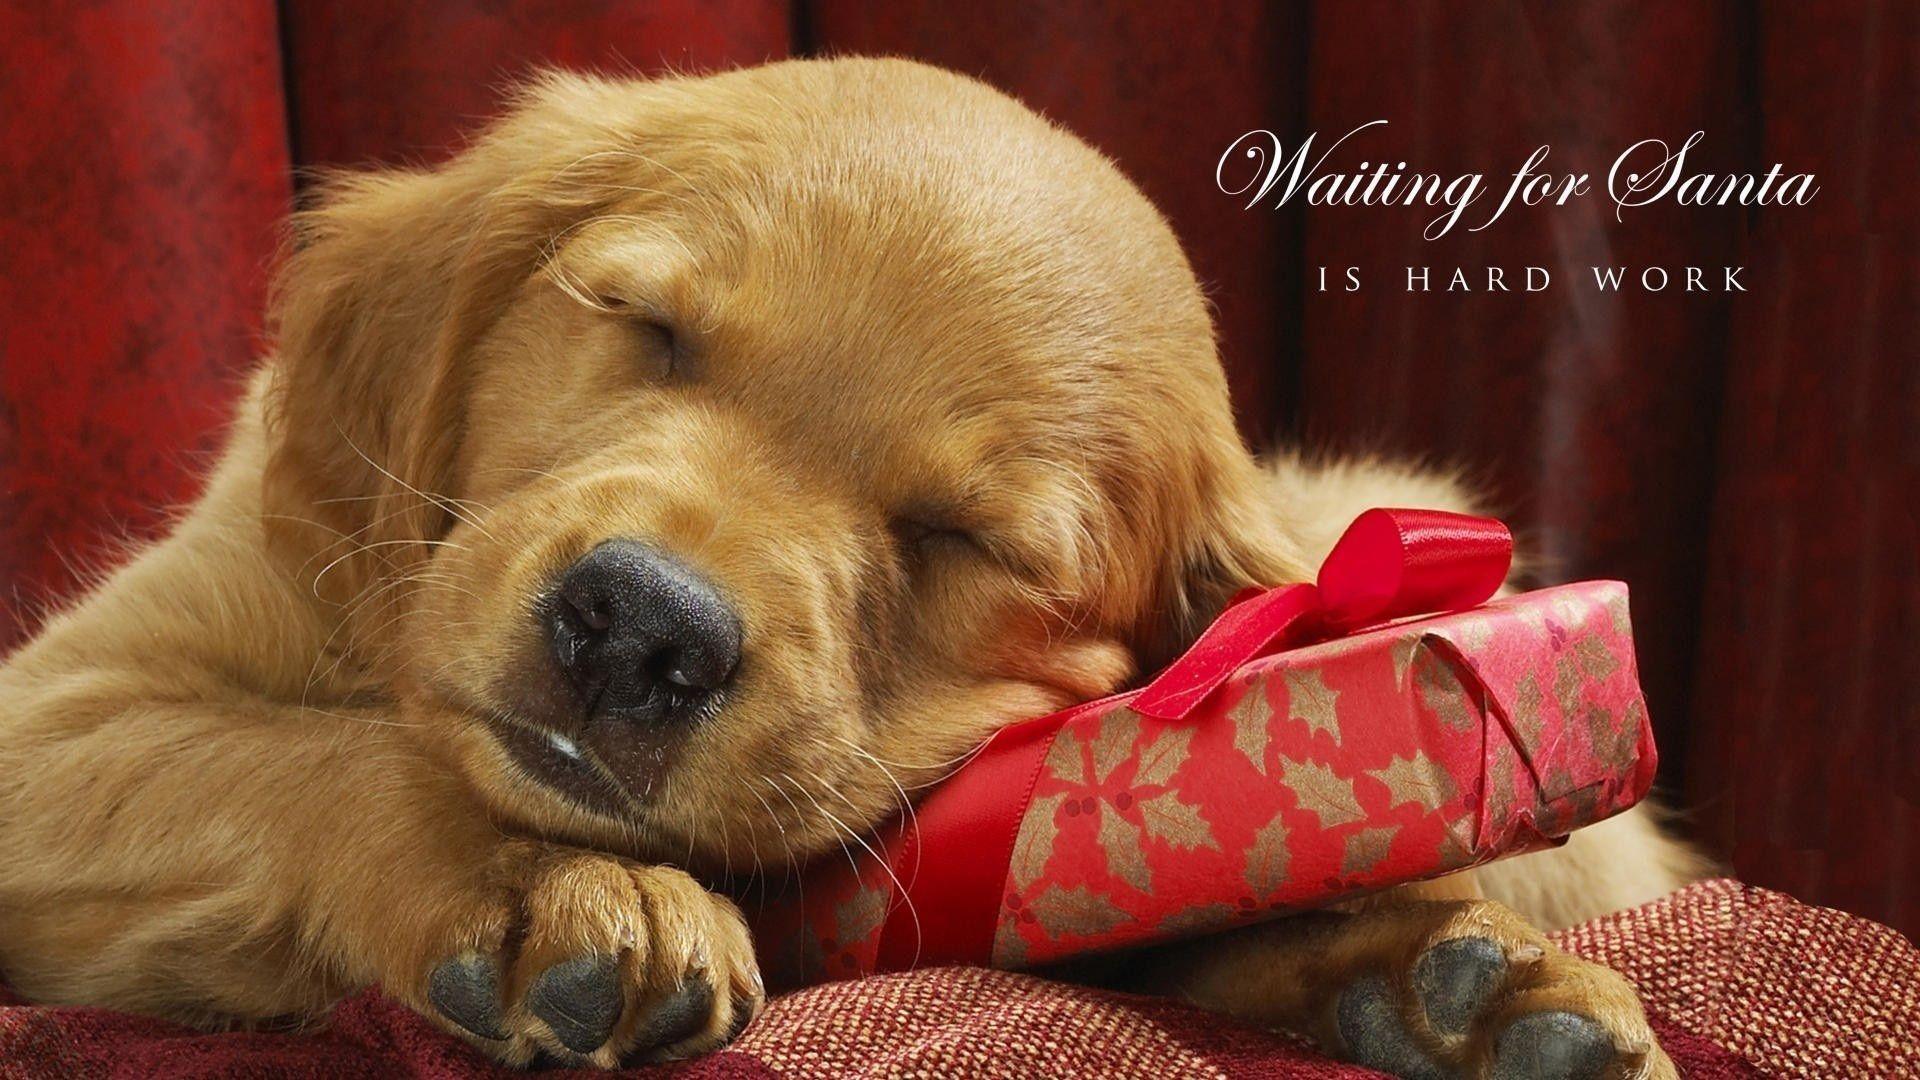 Sleeping Dog Christmas Wallpaper   HD Wallpapers 1920x1080